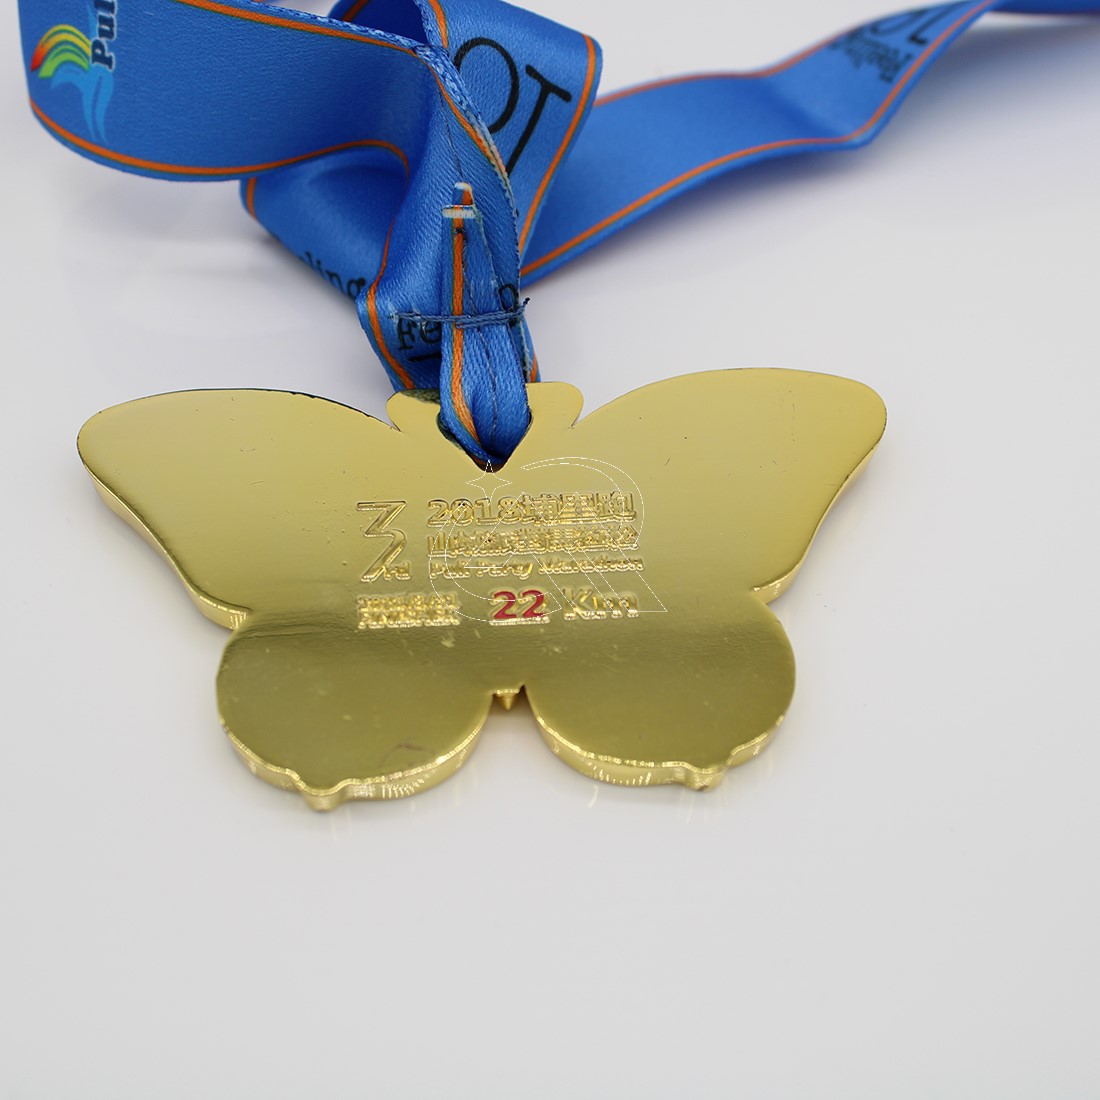 custom 22km medals